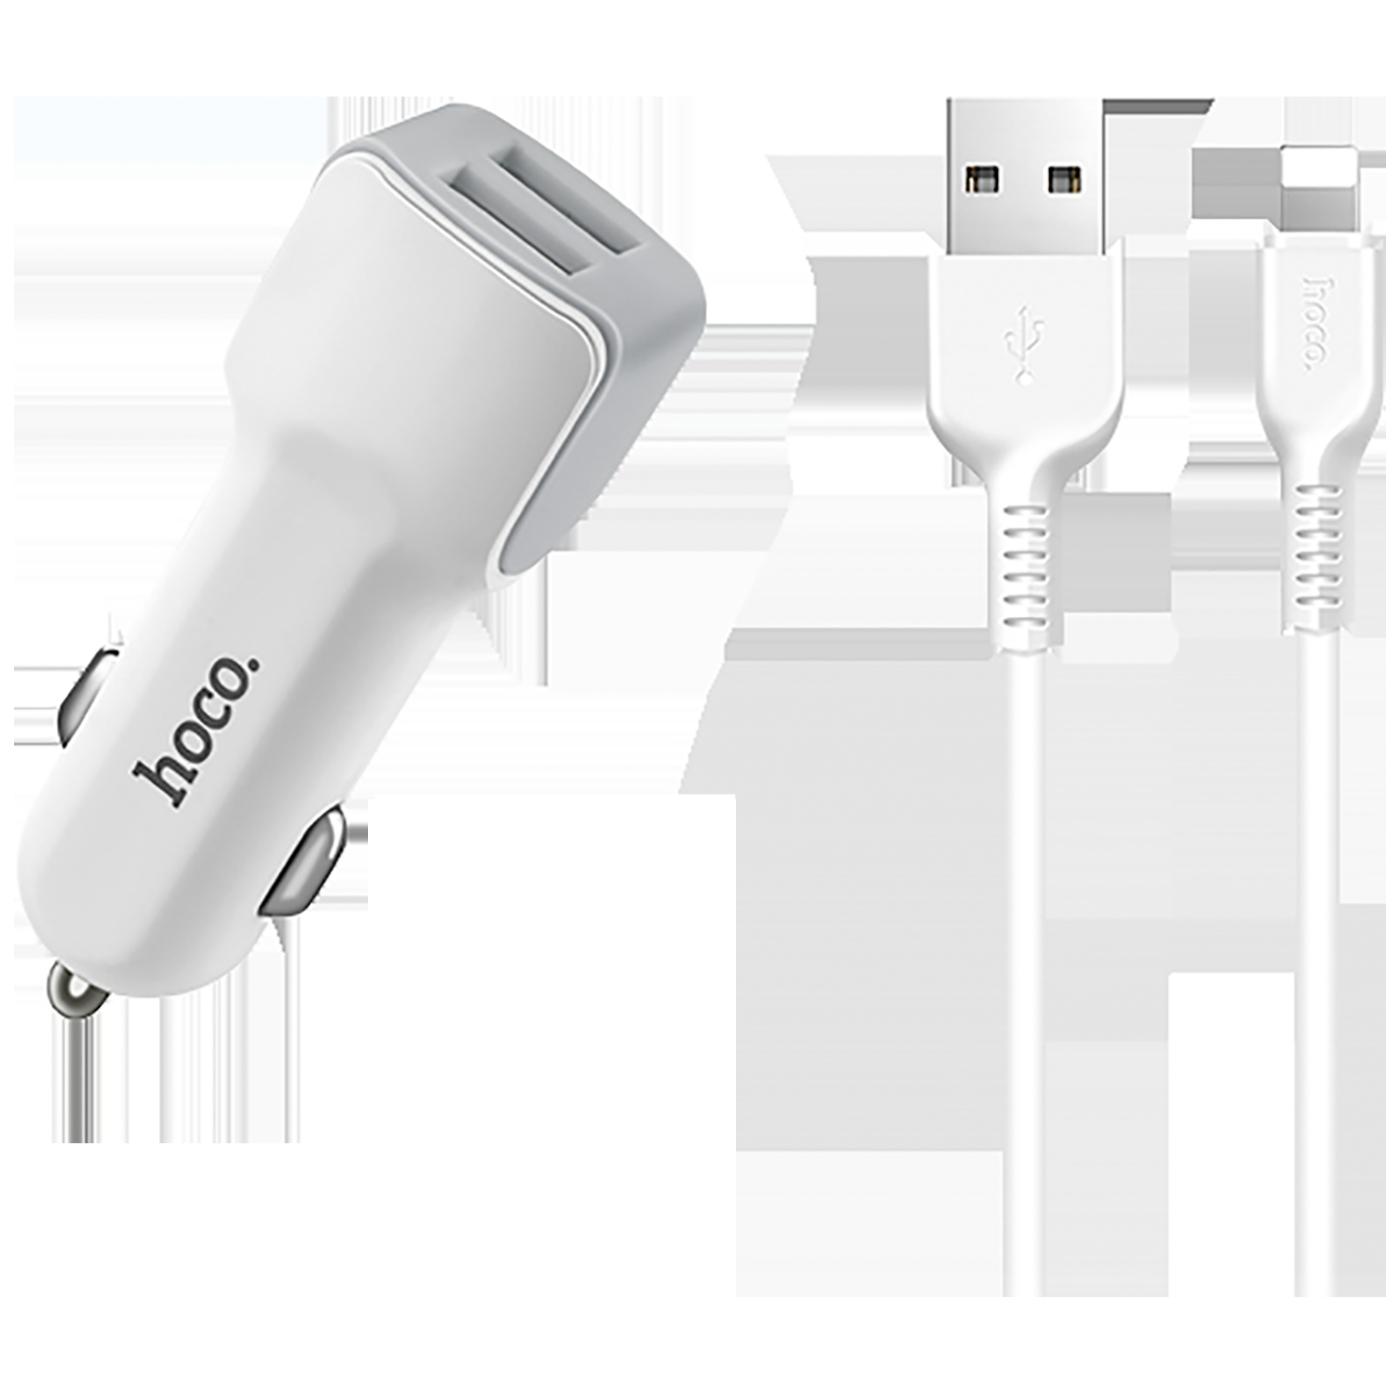 Auto punjač sa Lightning kabelom, 2 x USB, 5 V/2.4 A